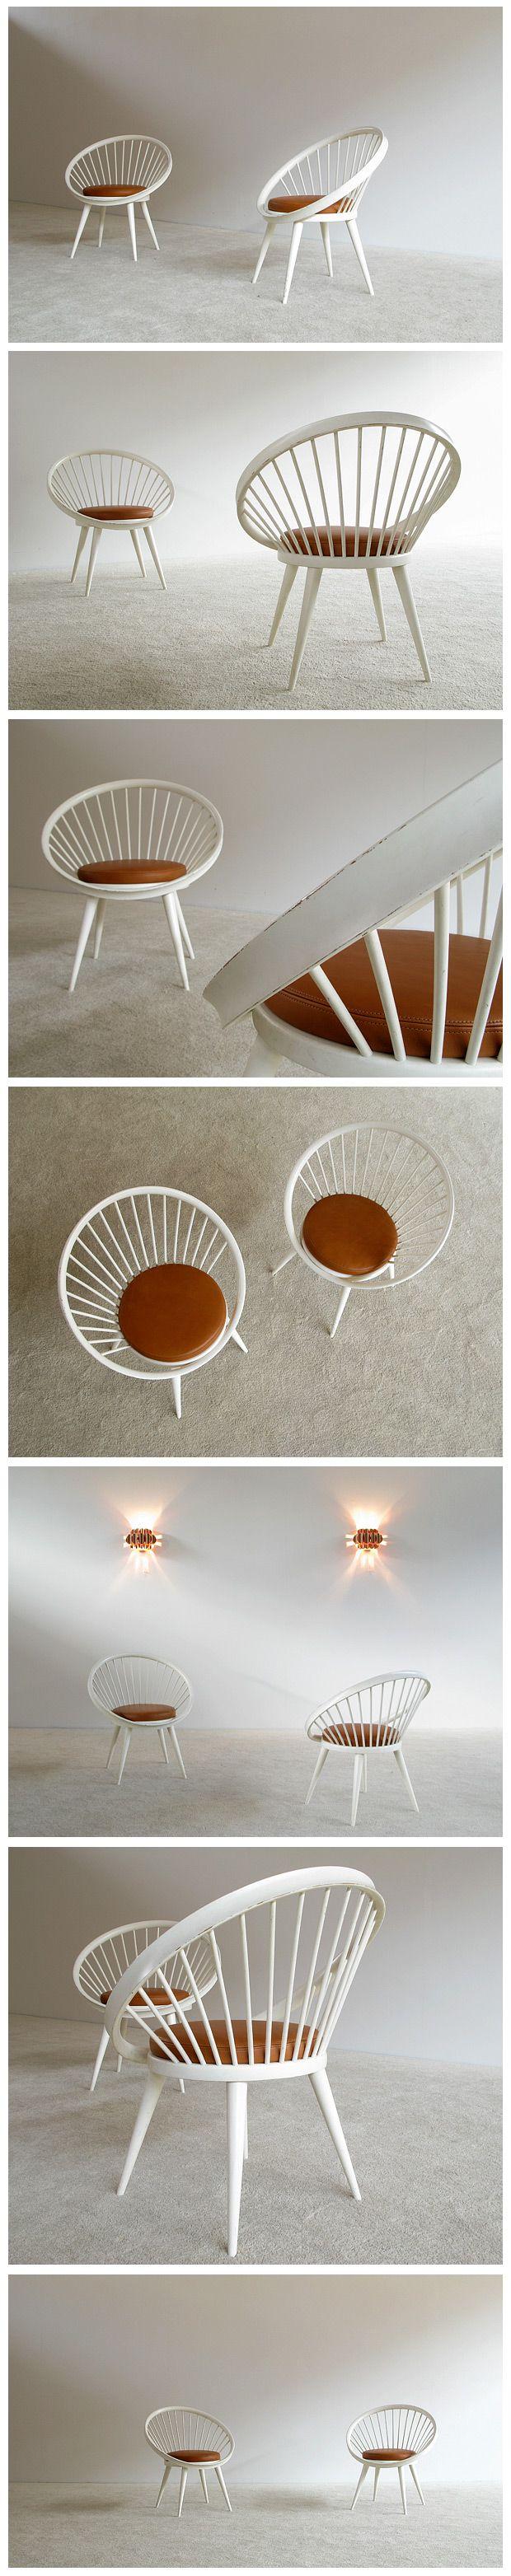 Pair of decorative side chairs Ekstrom